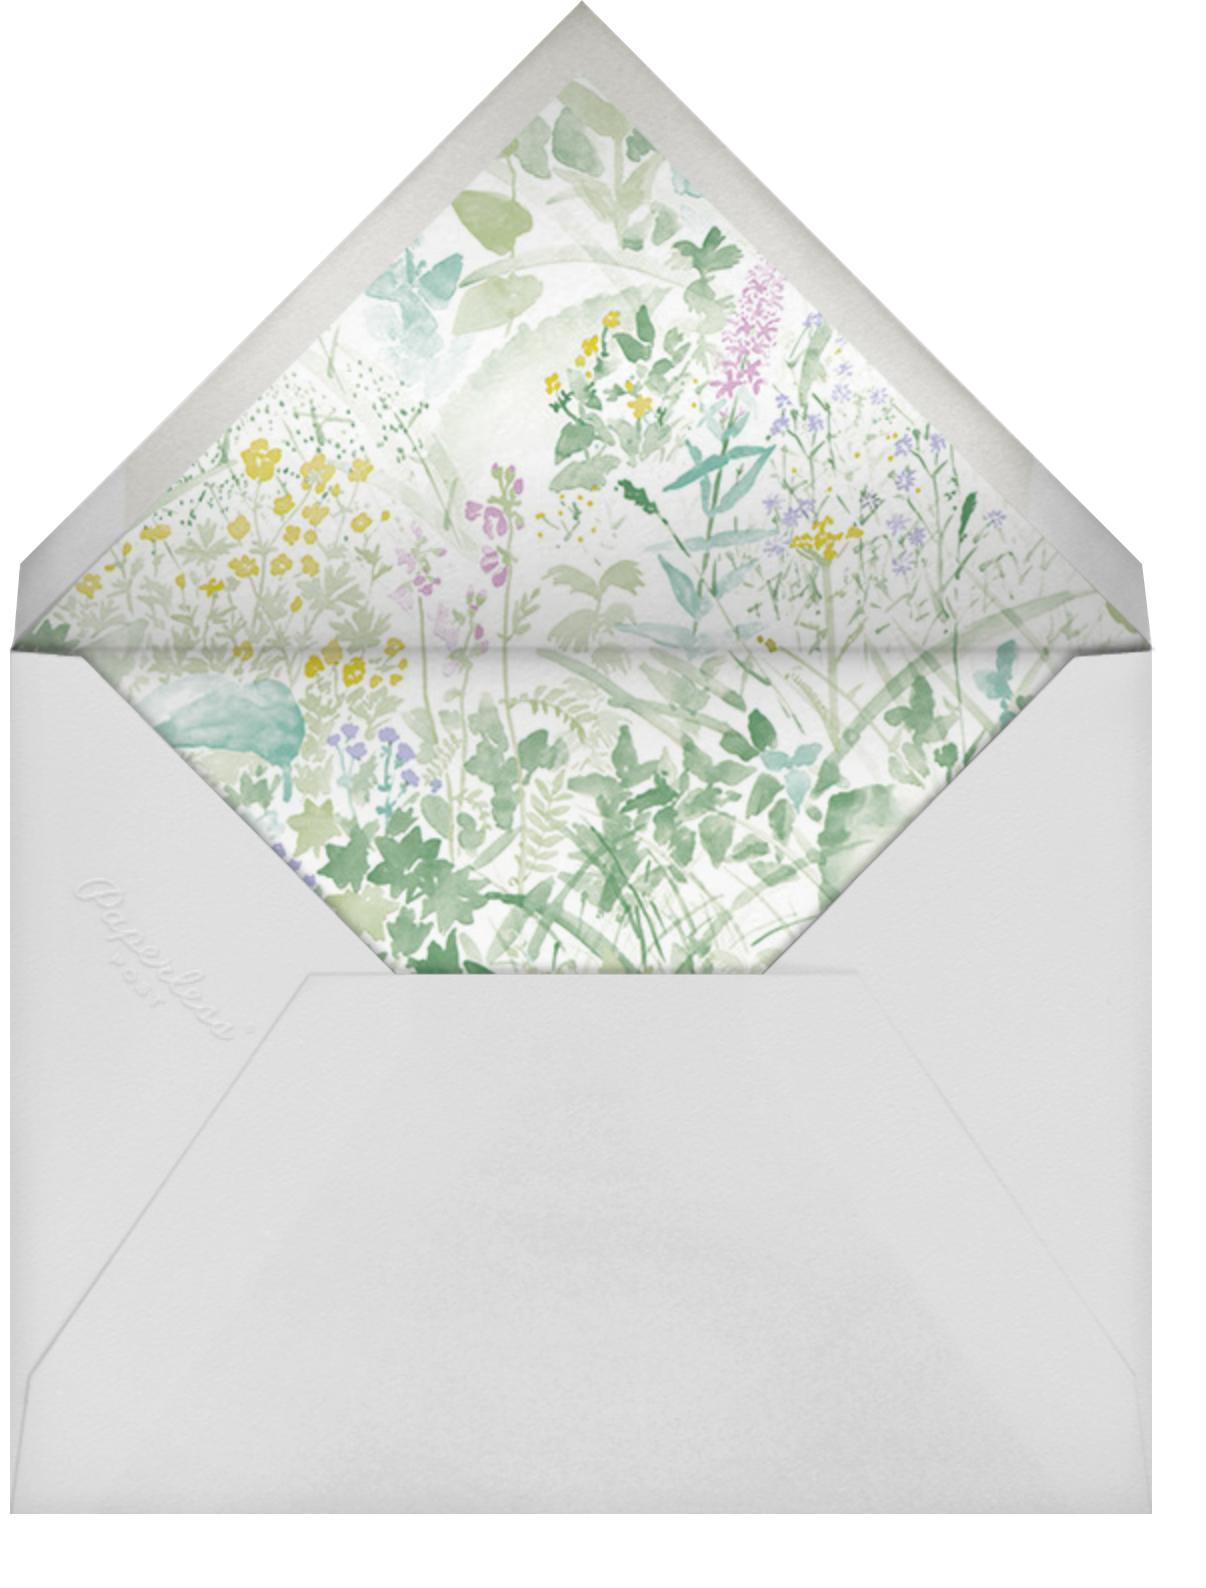 Kesanto (Tall) - Marimekko - Mother's Day - envelope back